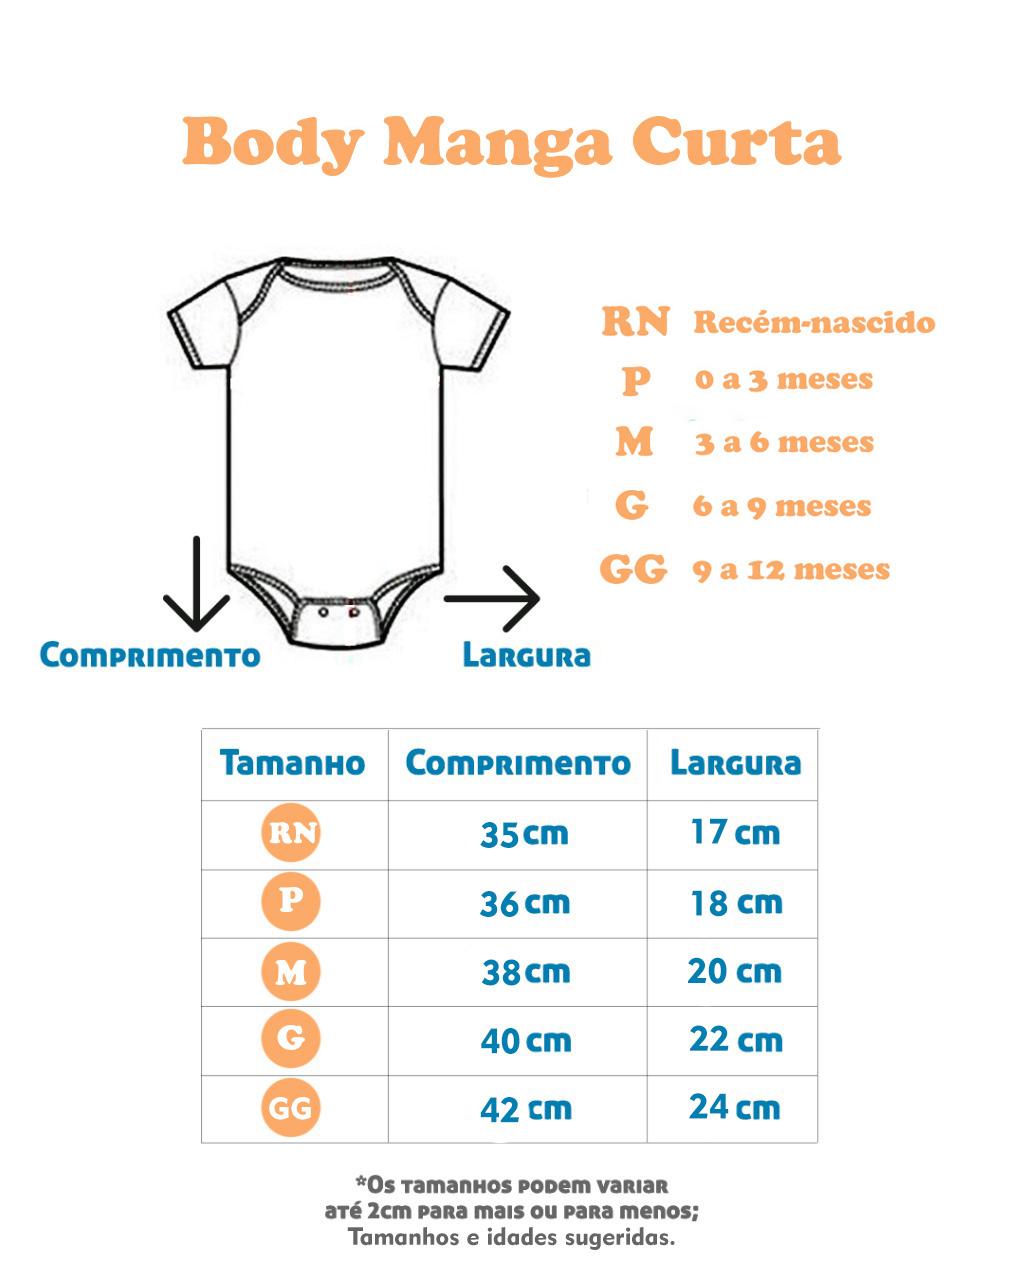 Body Manga Curta Lhama Rosa (RN/P/M/G/GG)